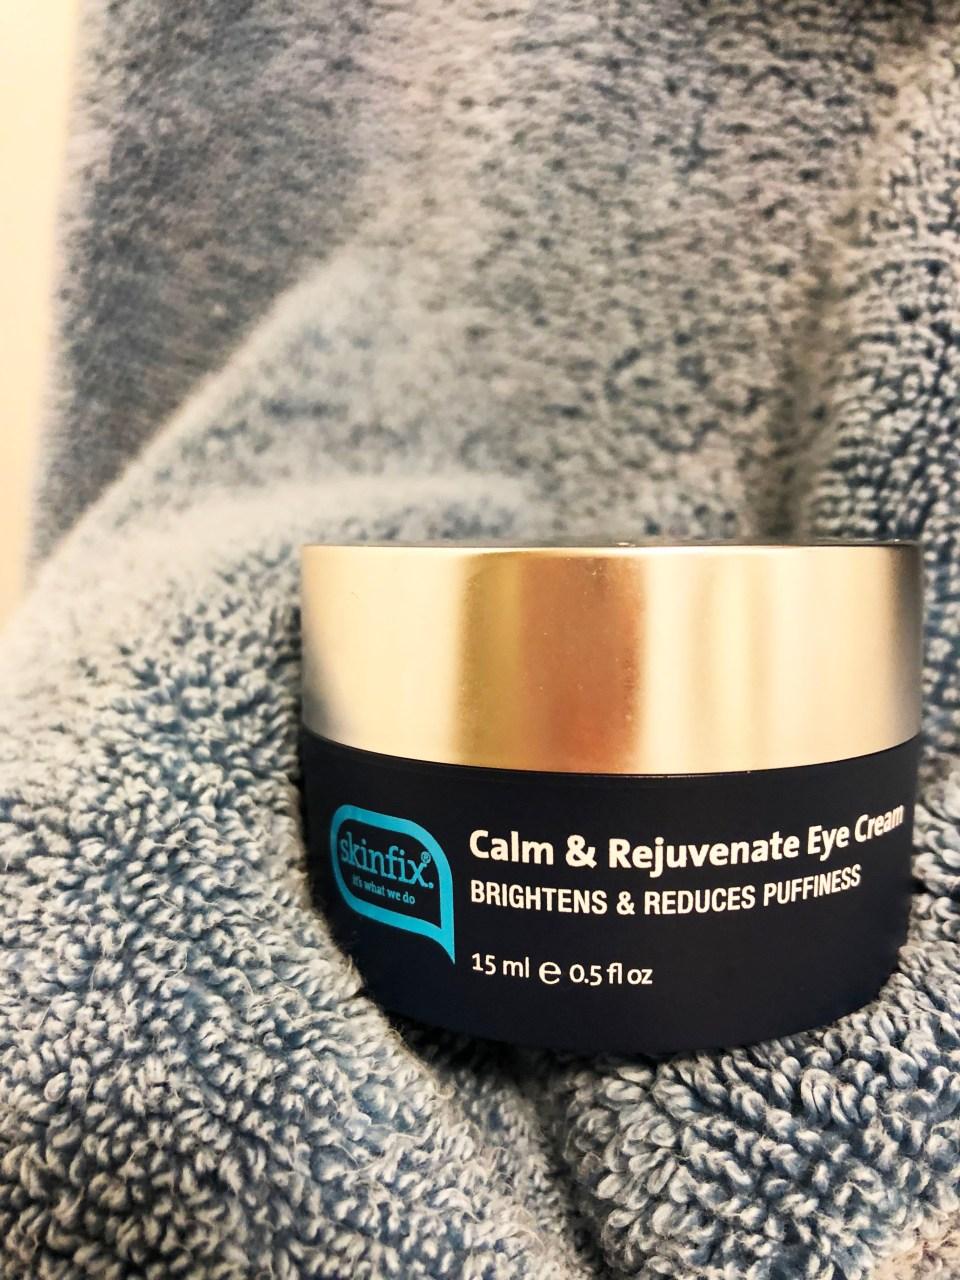 Skinfix Calm & Rejuvenate Eye Cream